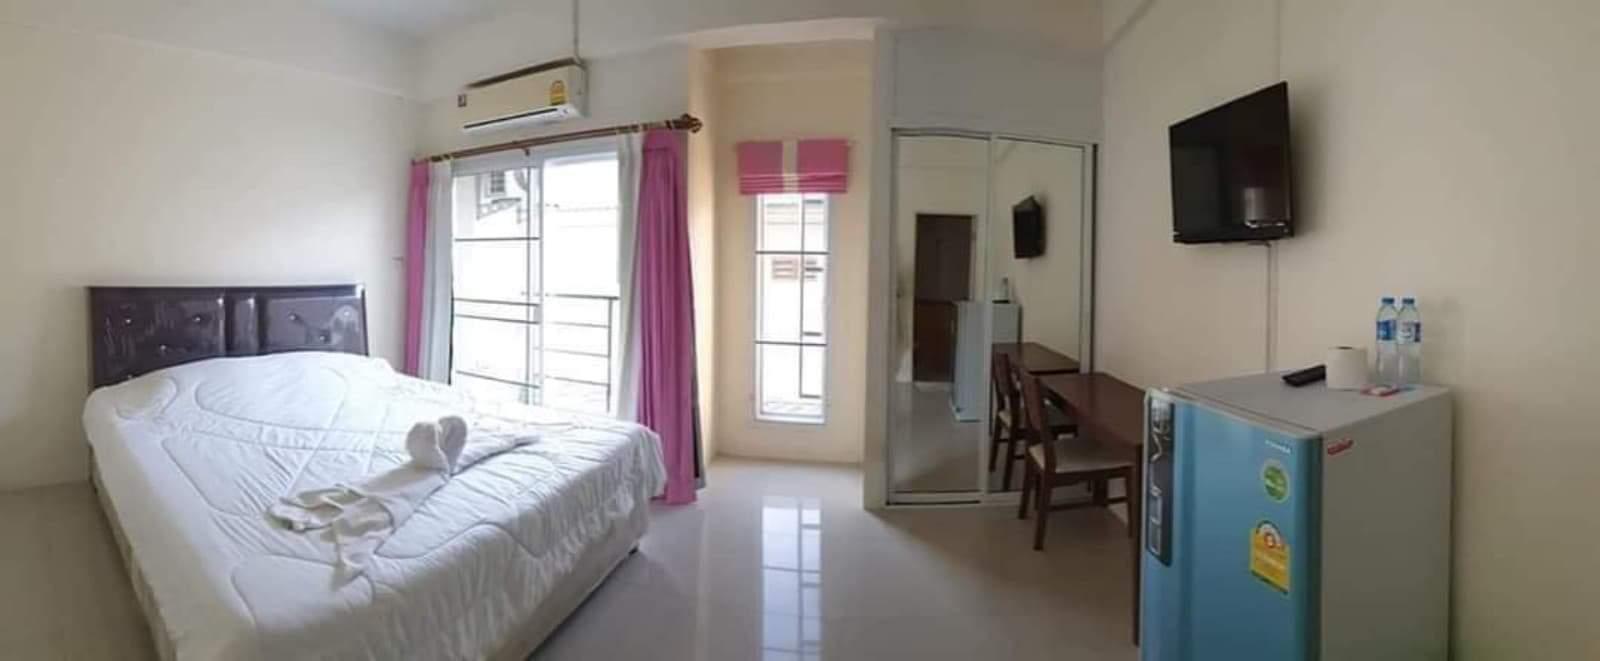 Memmory Bangsean อพาร์ตเมนต์ 1 ห้องนอน 1 ห้องน้ำส่วนตัว ขนาด 24 ตร.ม. – บางแสน